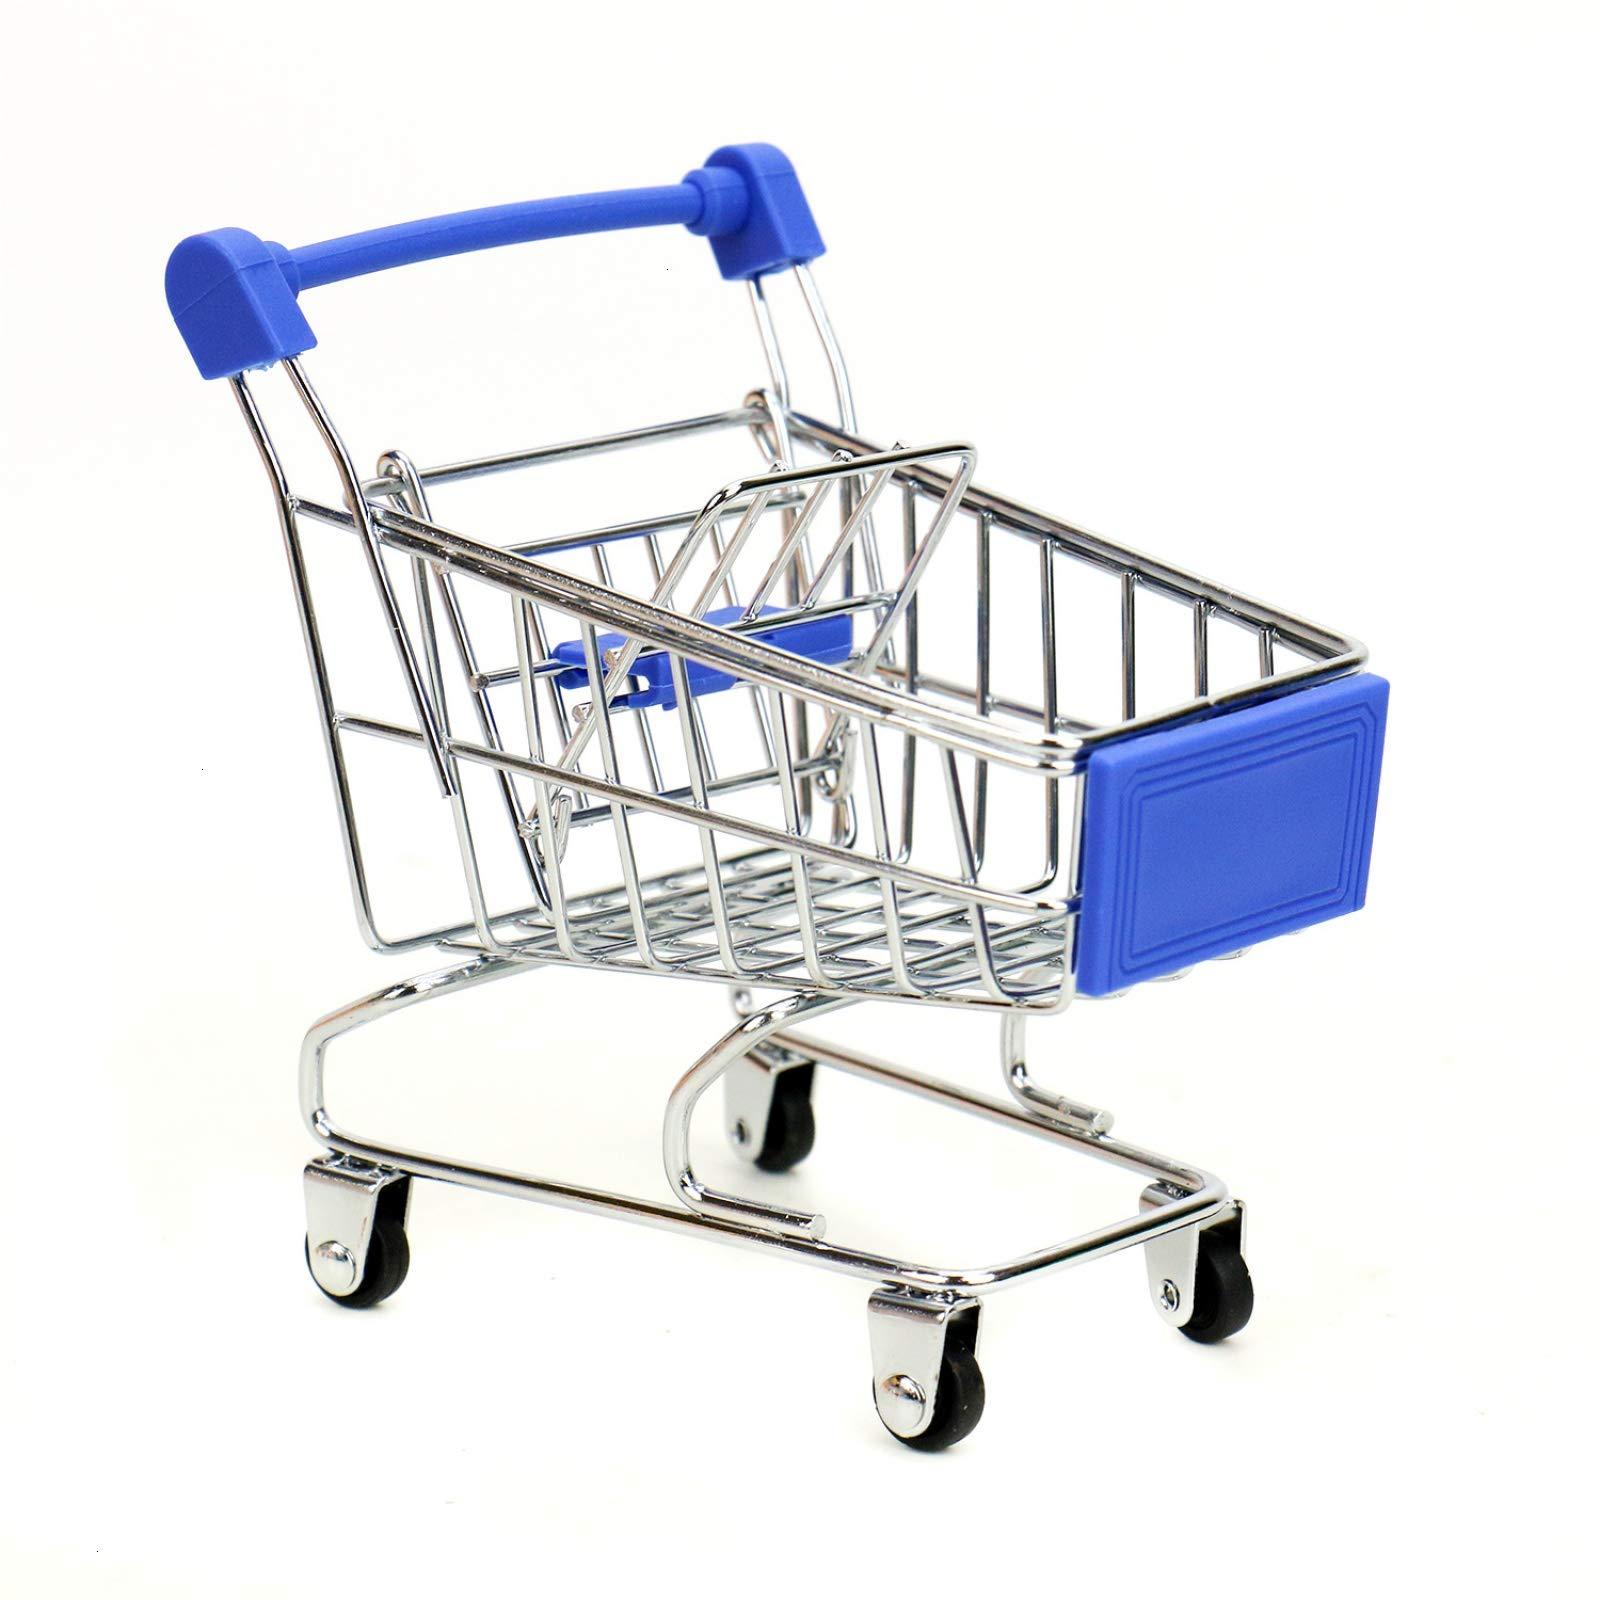 WSSROGY 3 Pack Mini Supermarket Handcart Cart Mode Storage Toy Table Office Novelty Decoration by WSSROGY (Image #6)